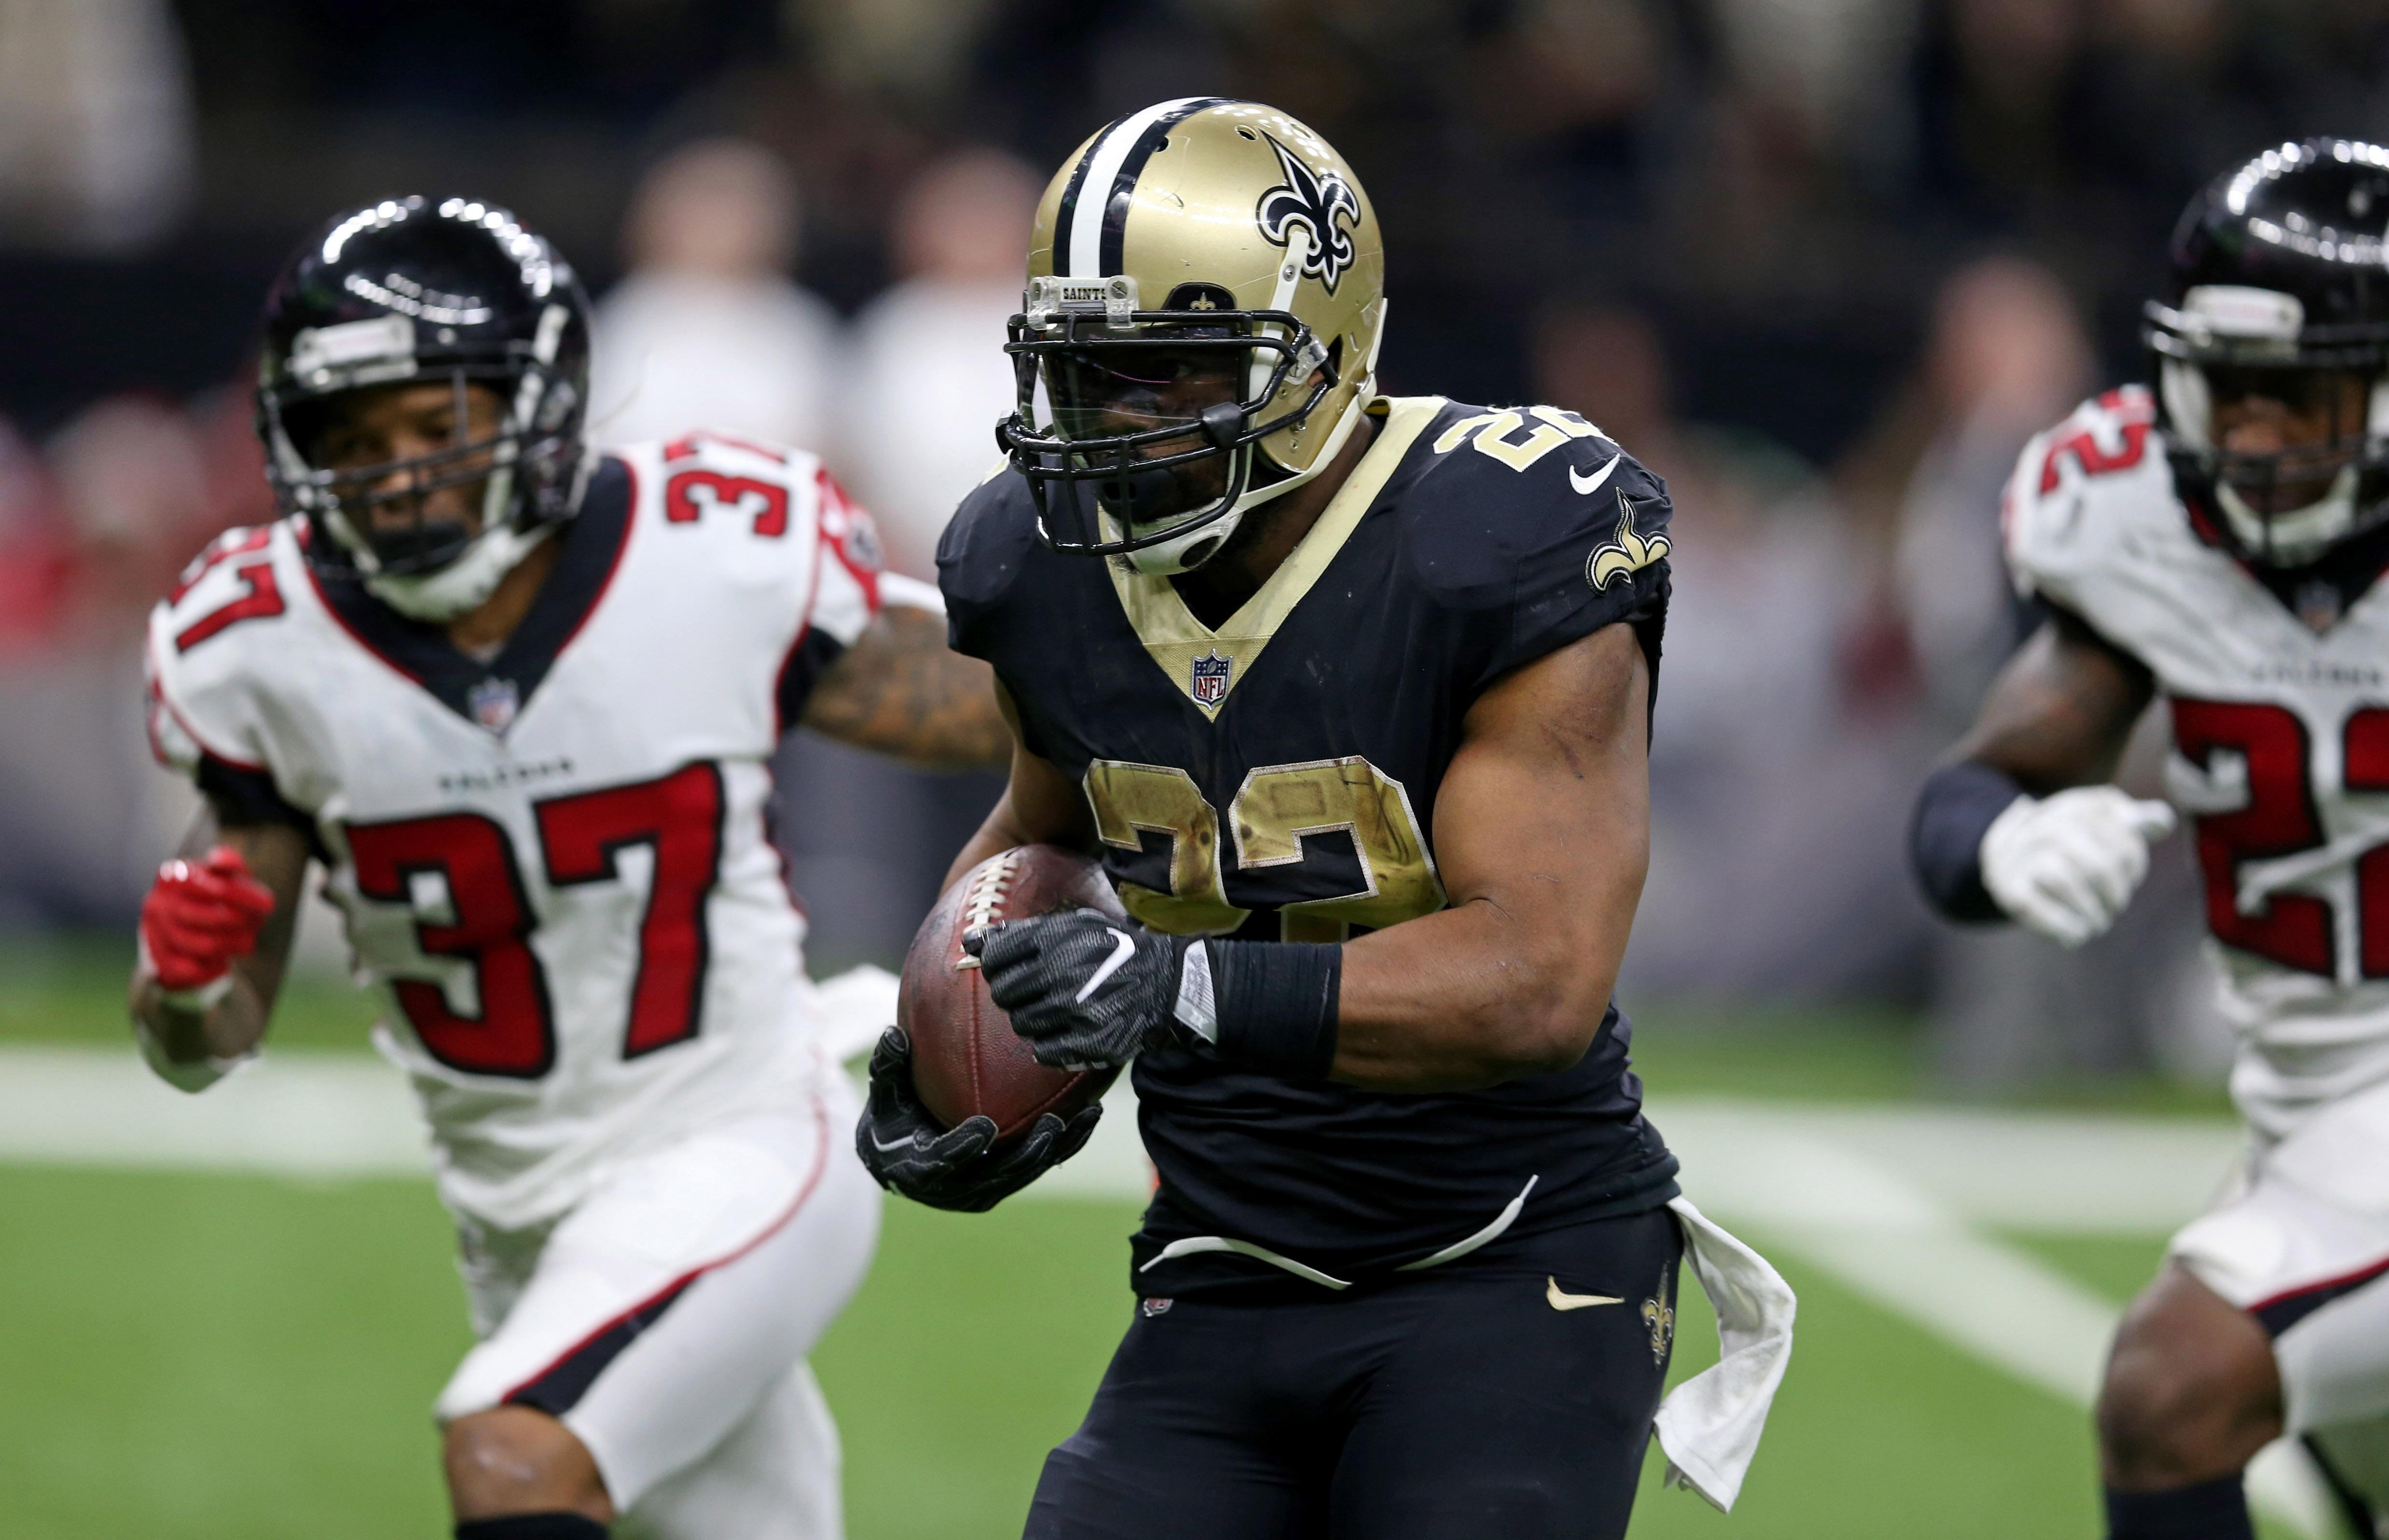 PHOTOS: Falcons vs. Saints in New Orleans